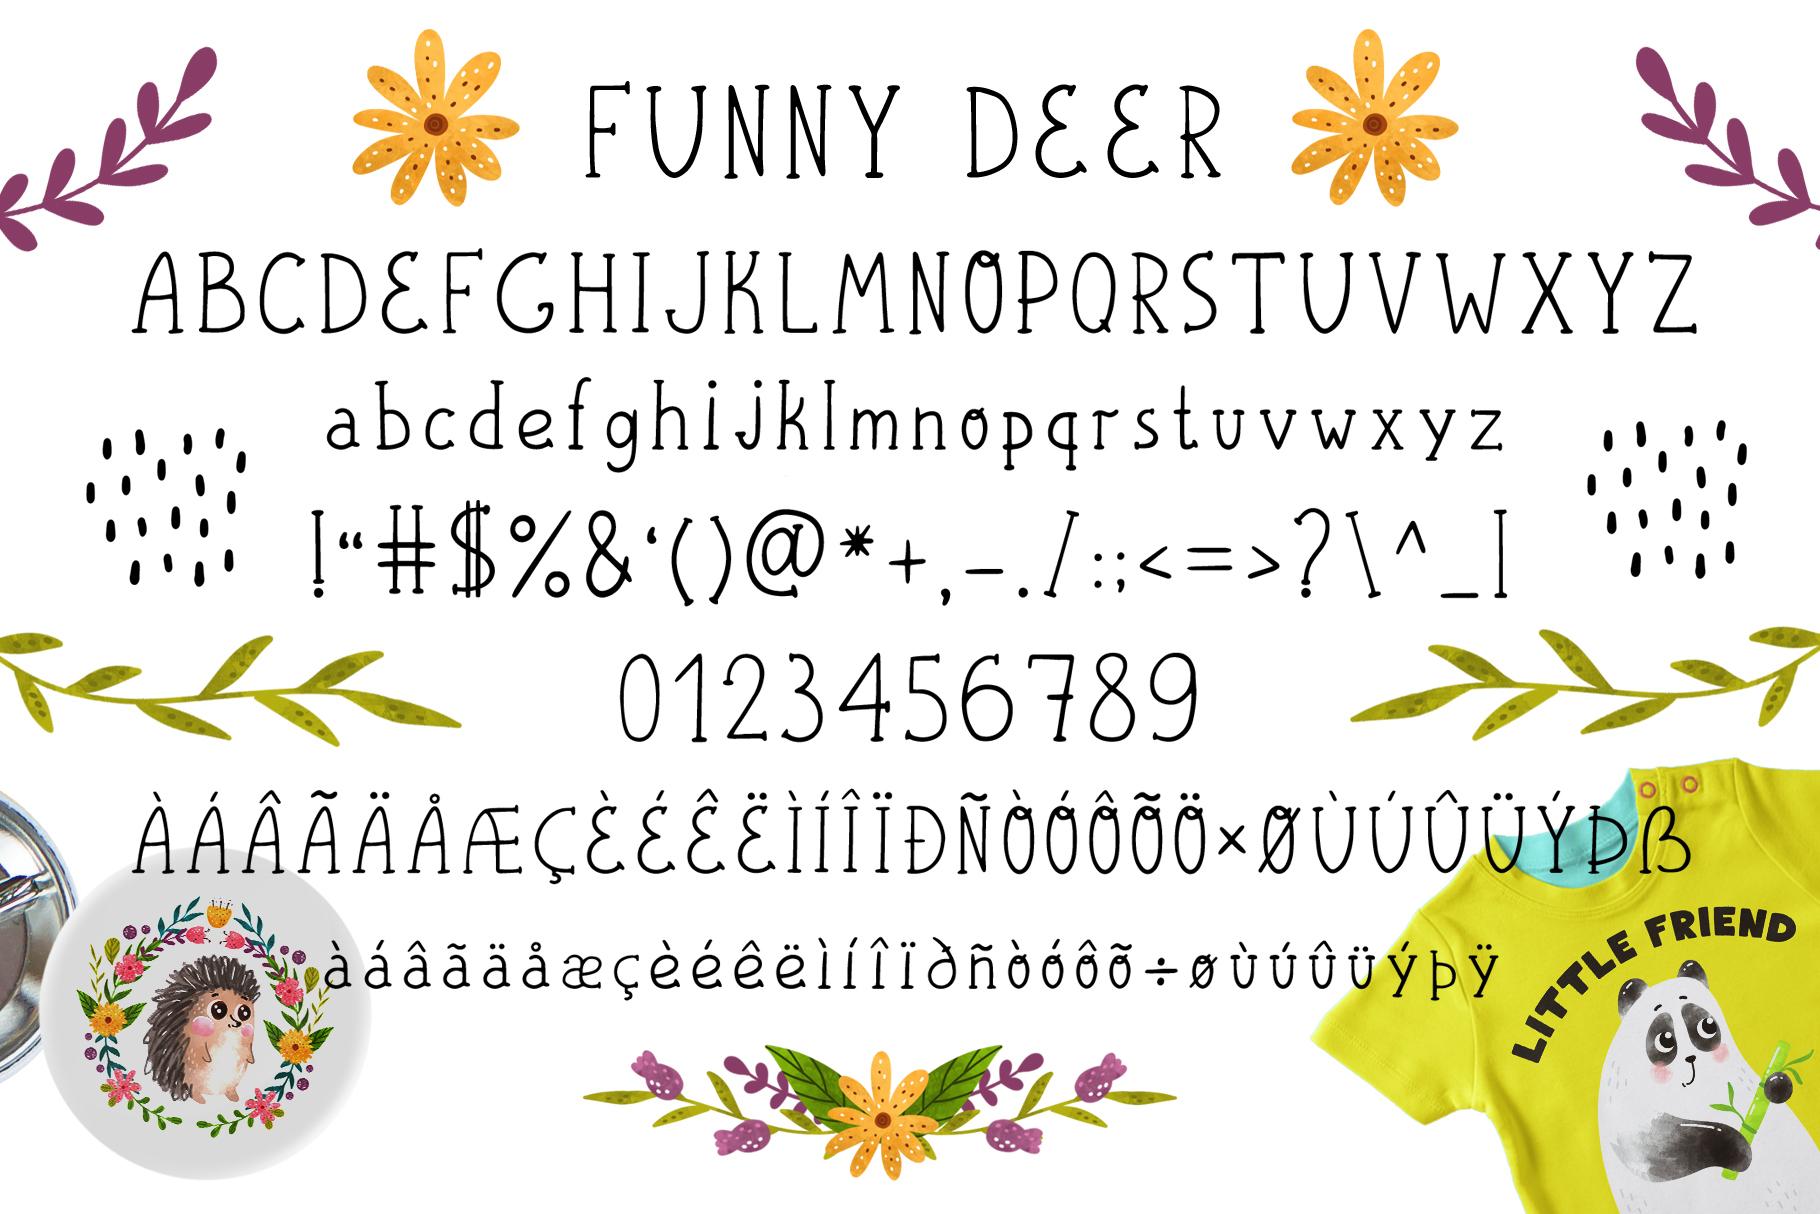 Funnybear & Funnydeer - Duo font example image 5